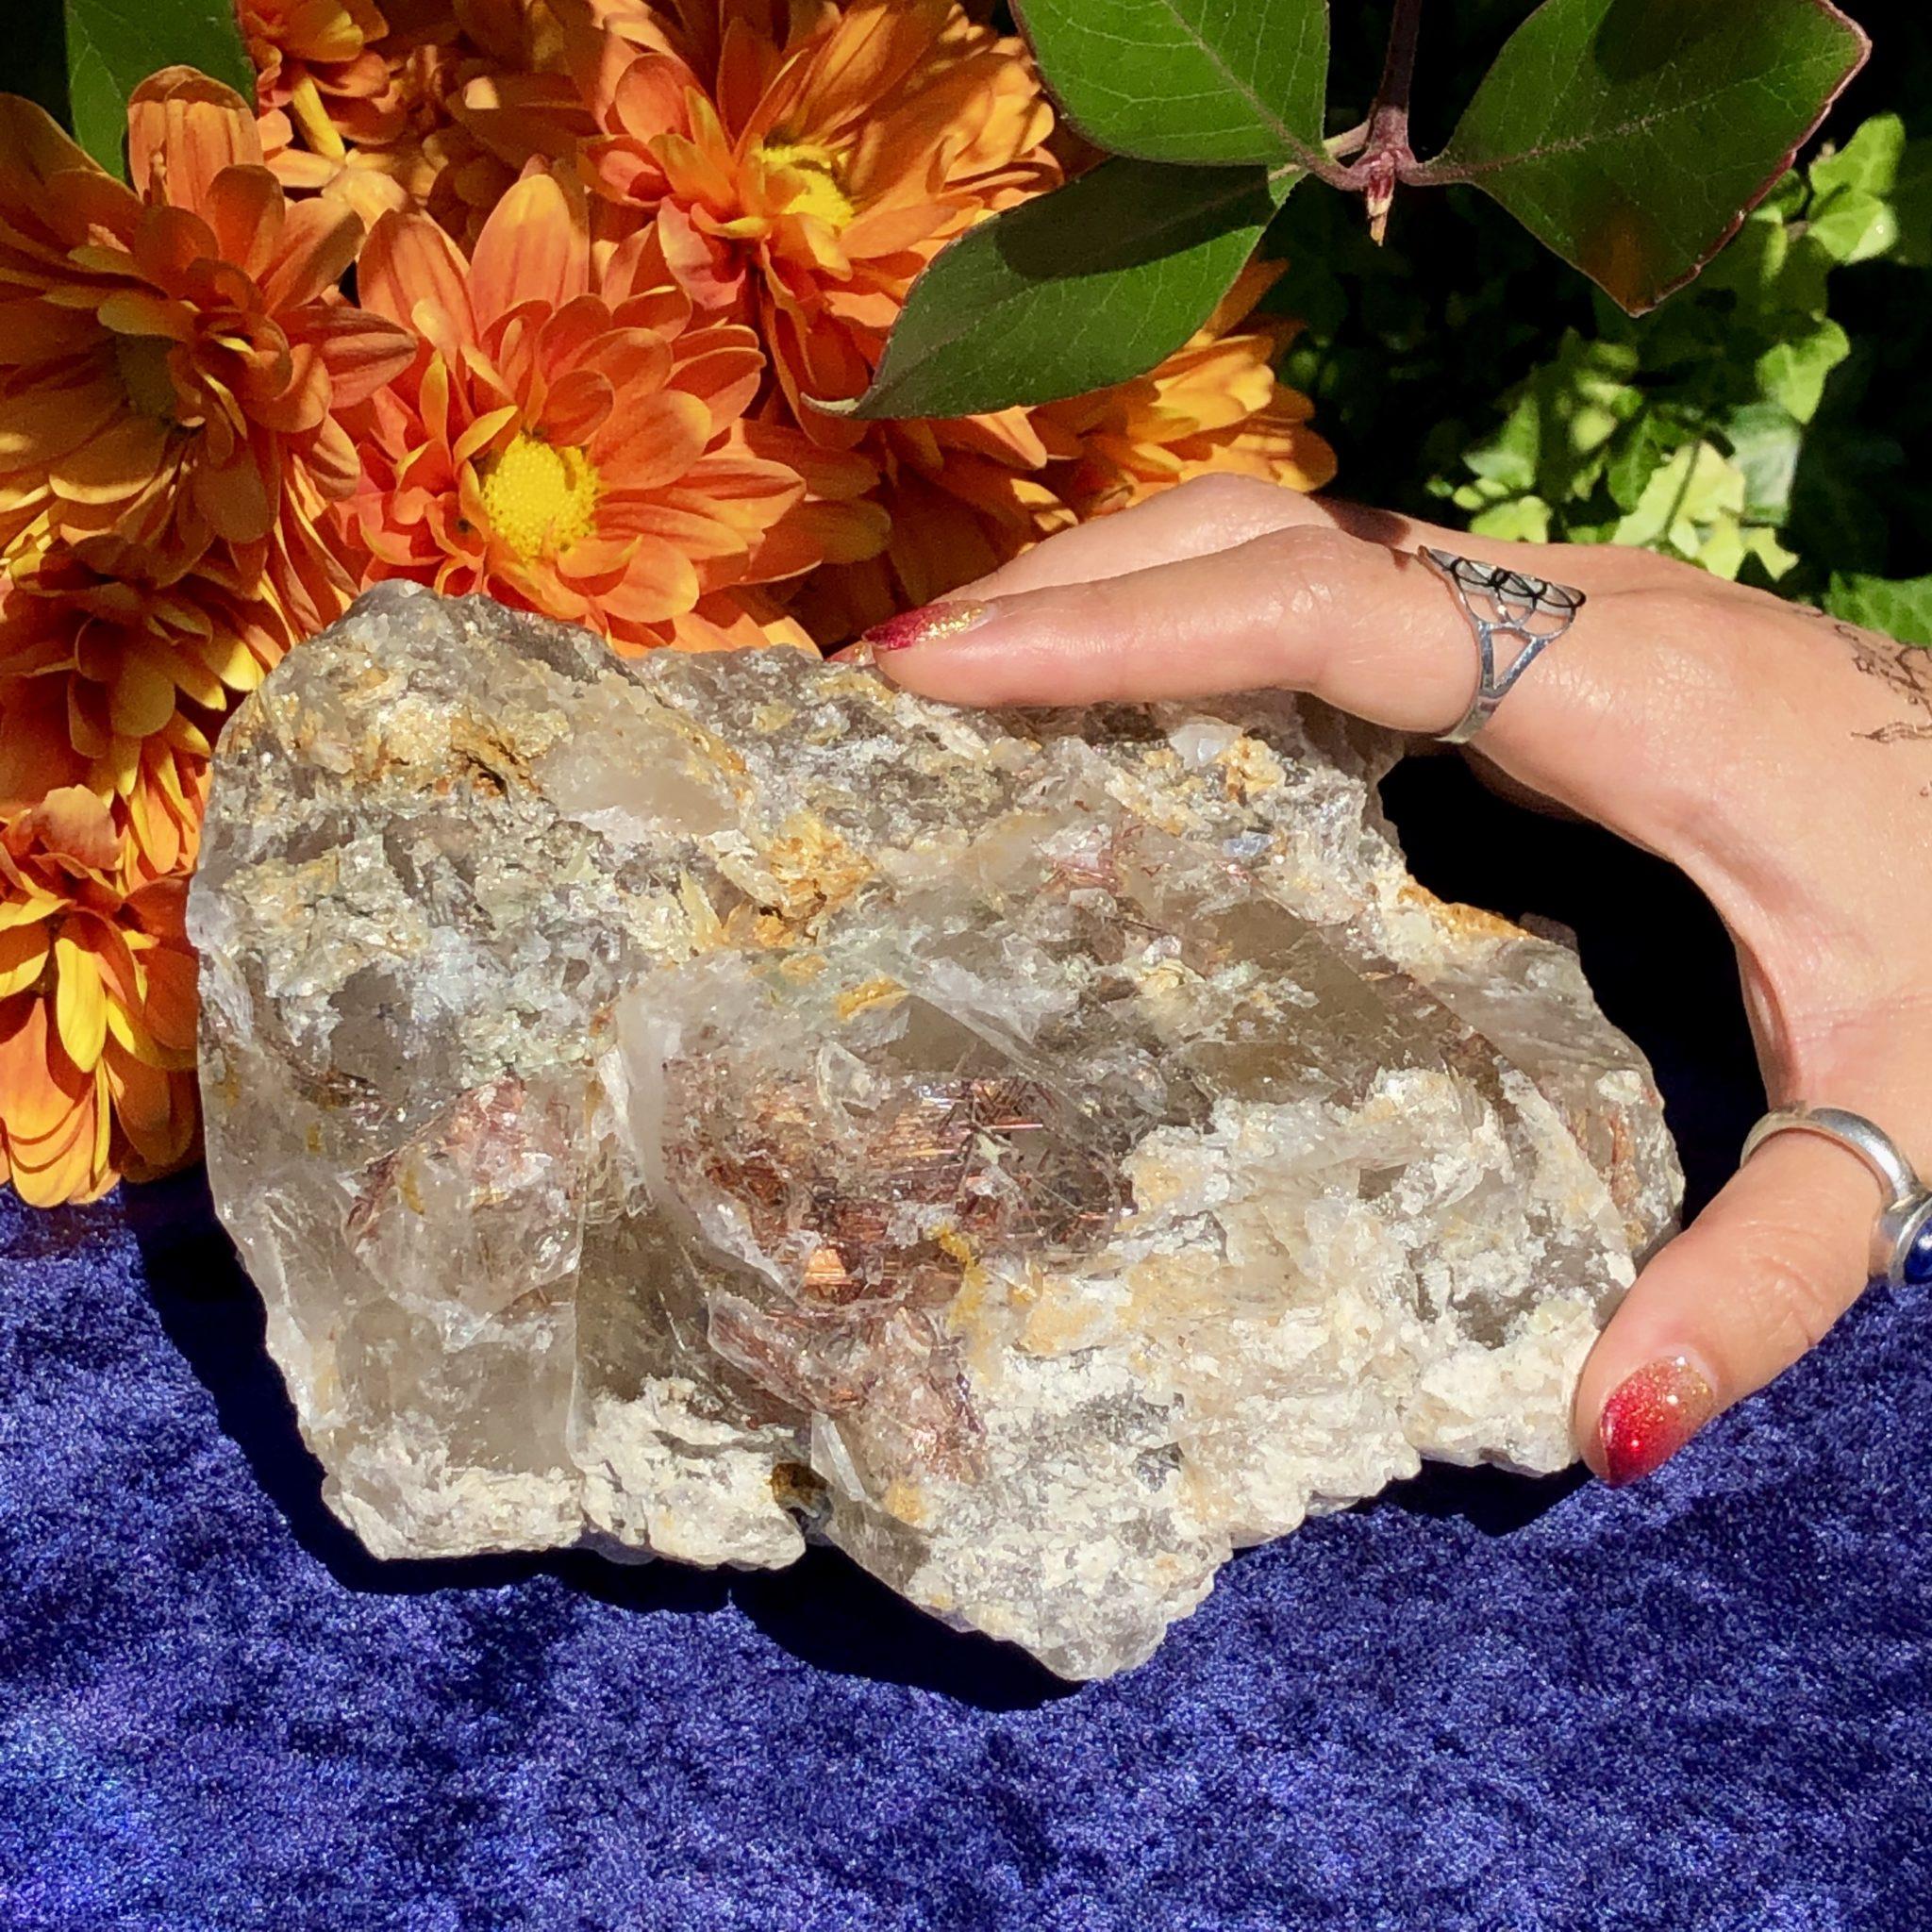 Gemstone Sale: Skeletal Elestial Smoky Quartz with Sagenite